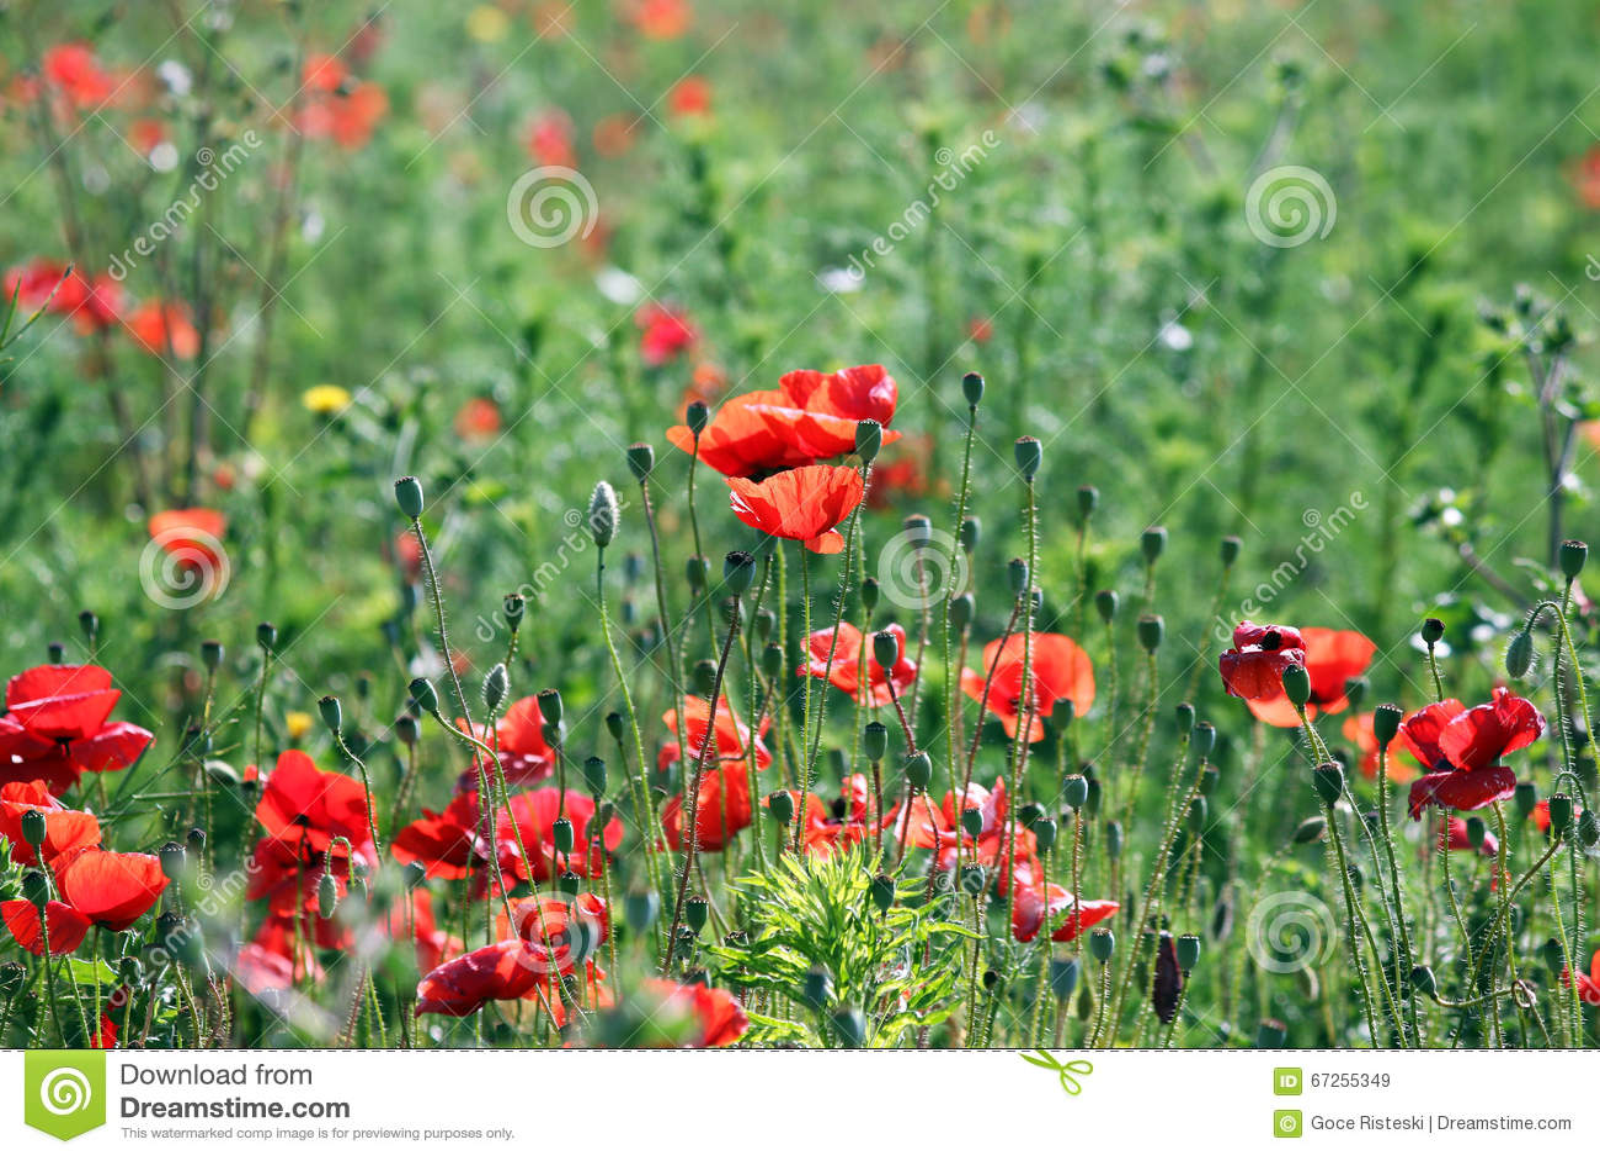 Poppies Flower Field Stock Photo 67255349 Megapixl